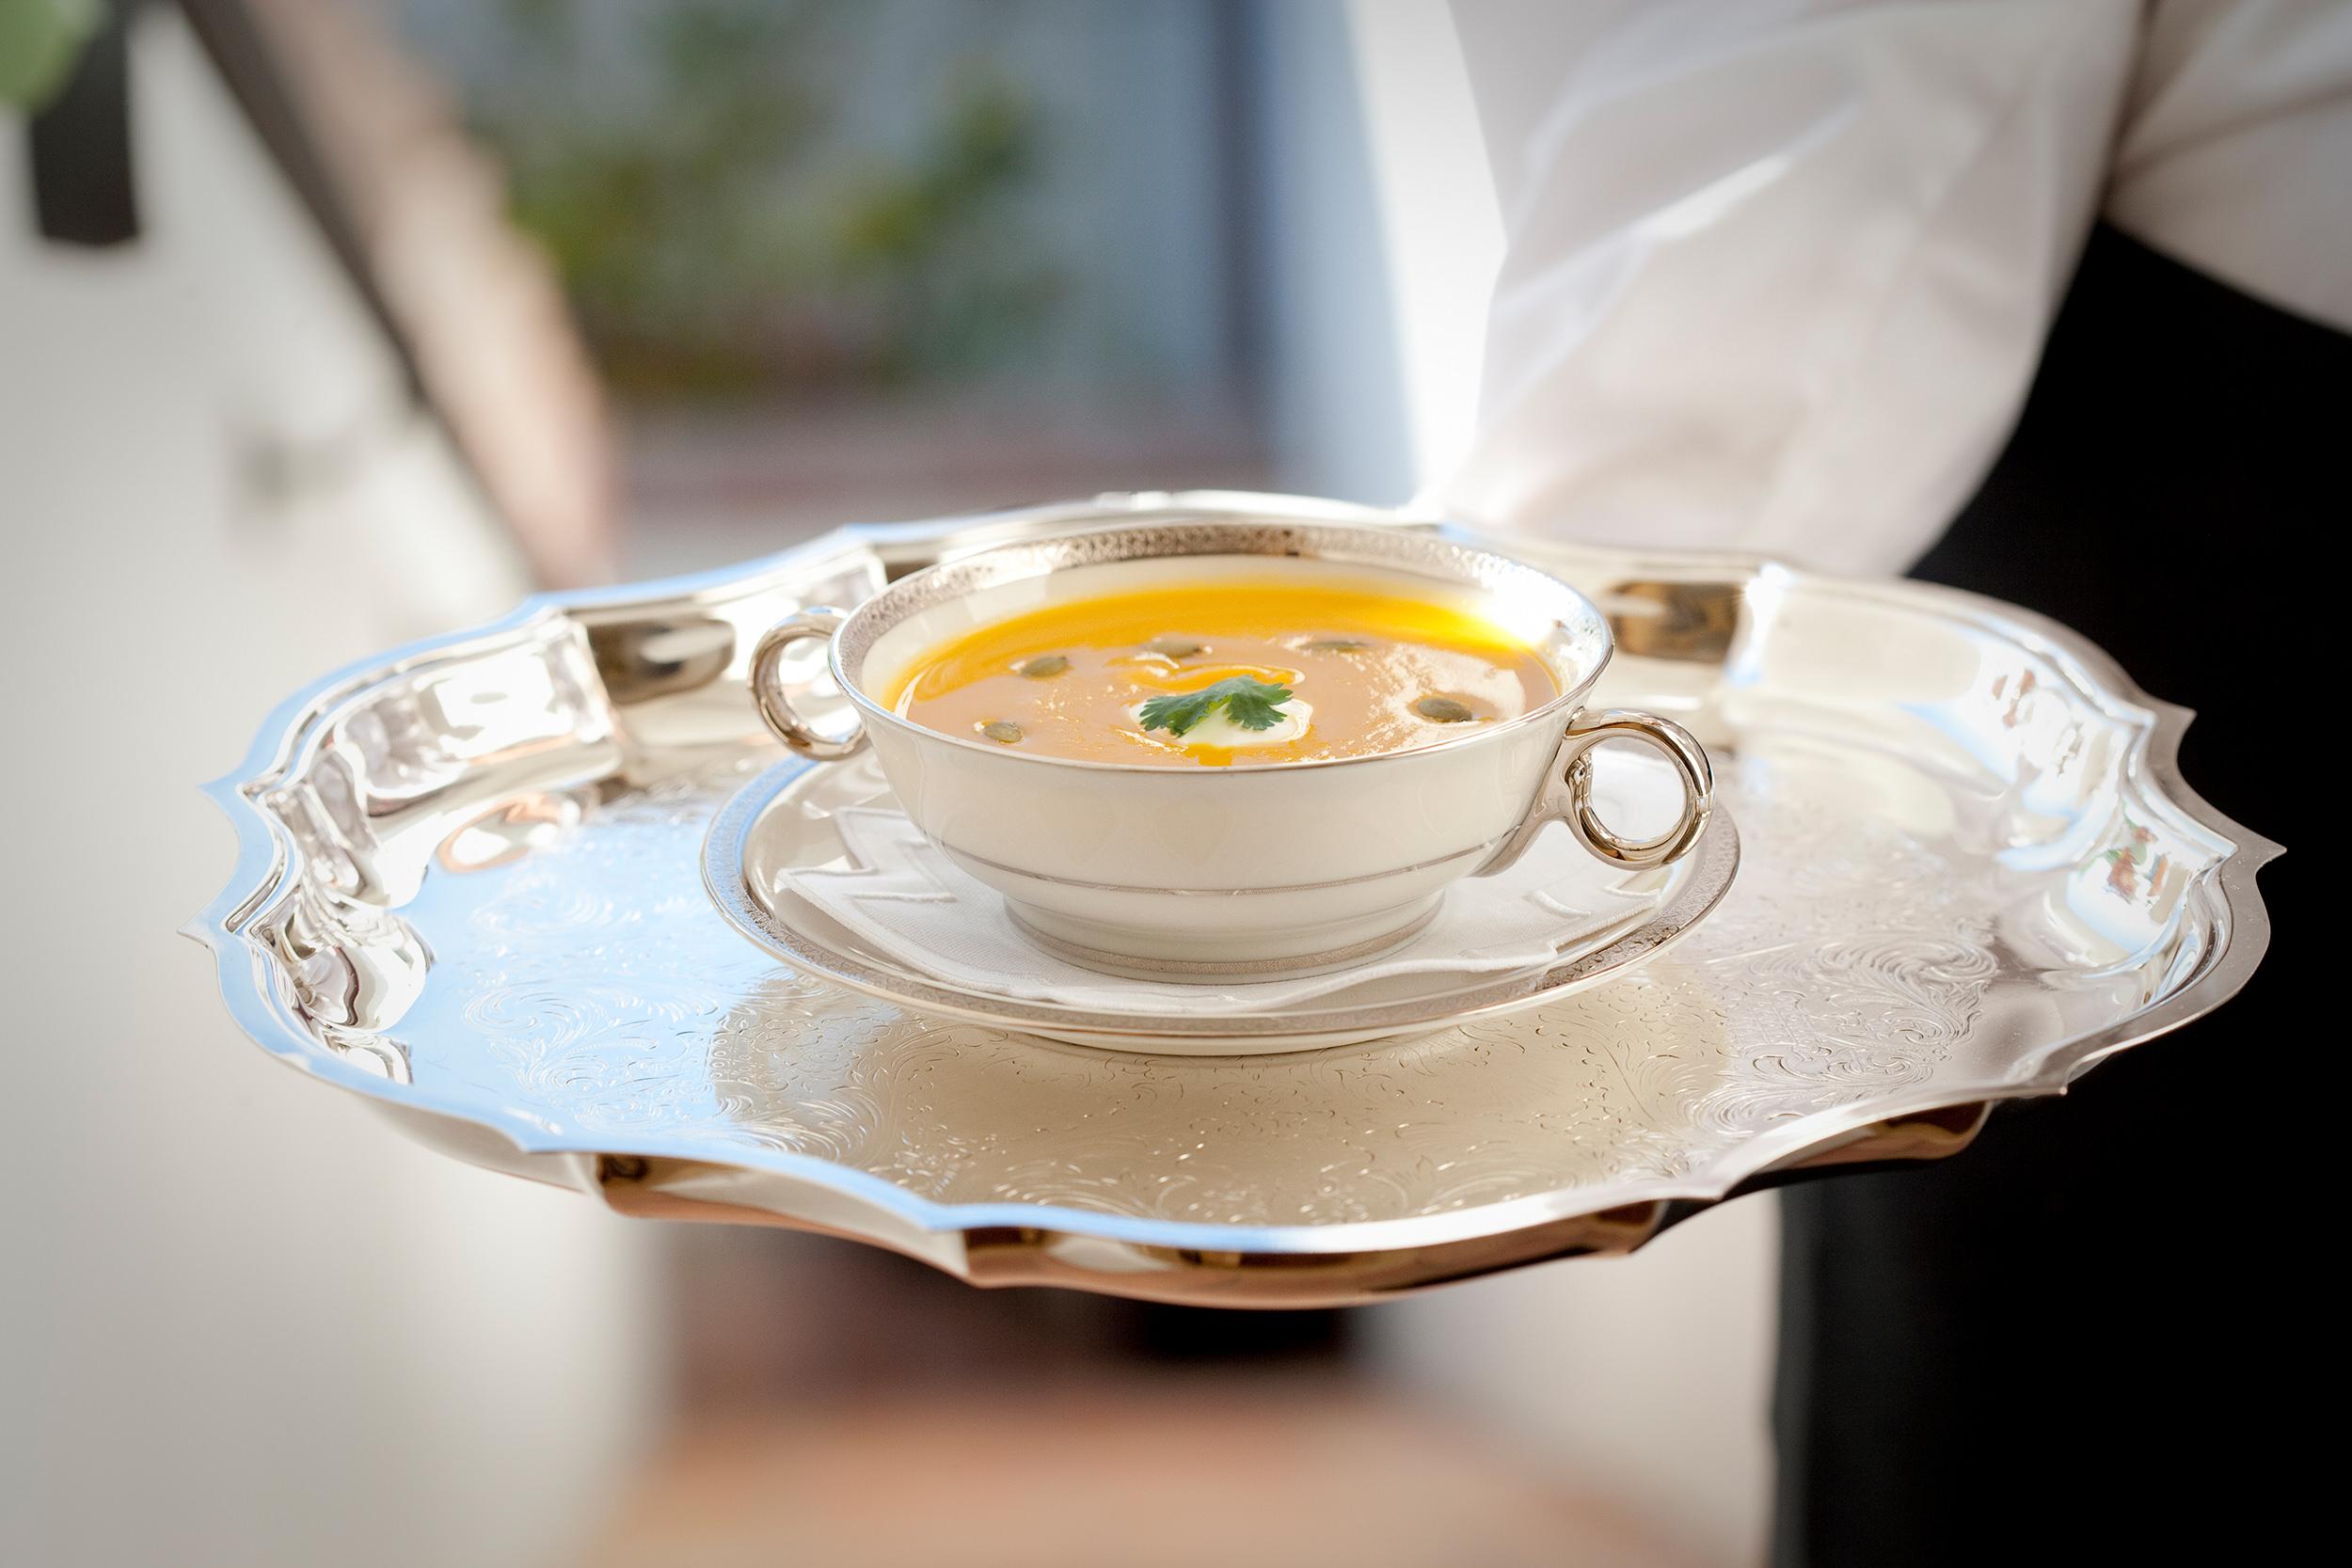 Gaszton_Hotel_Resort_Photographe_Food_0283.jpg